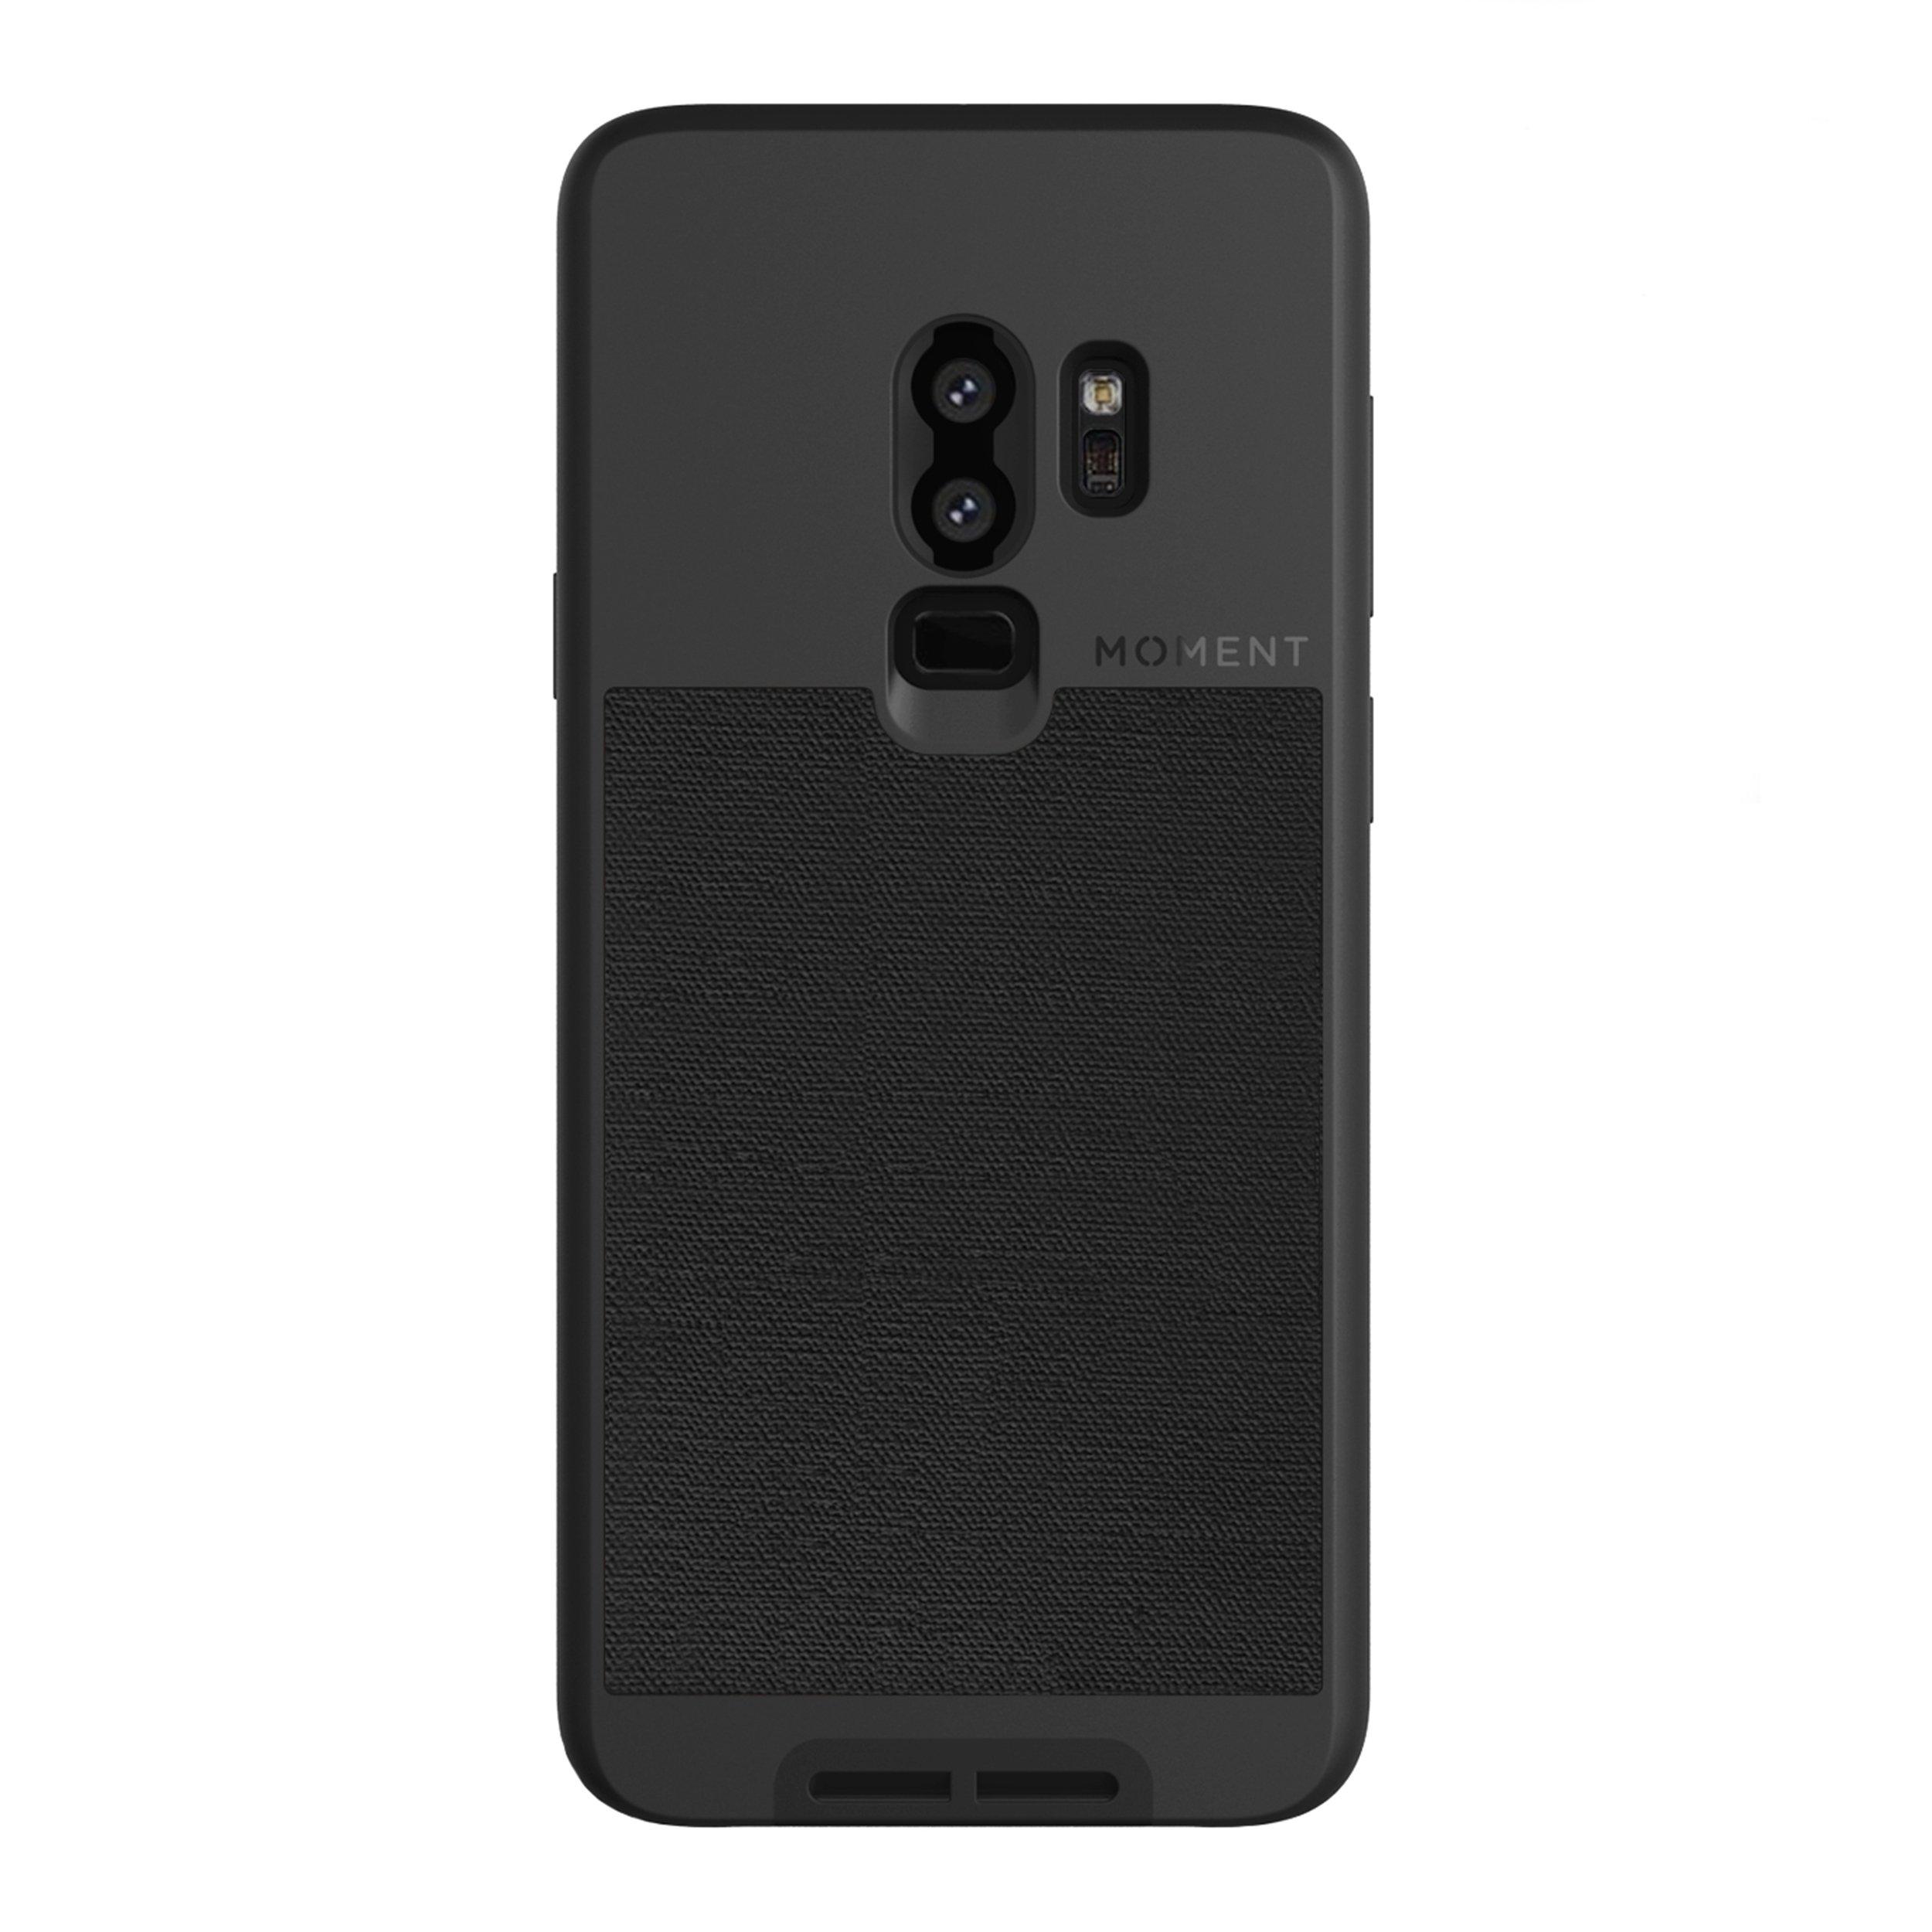 ویکالا · خرید  اصل اورجینال · خرید از آمازون · Galaxy S9+ Case || Moment Photo Case in Black Canvas - Thin, Protective, Wrist Strap Friendly case for Camera Lovers. wekala · ویکالا